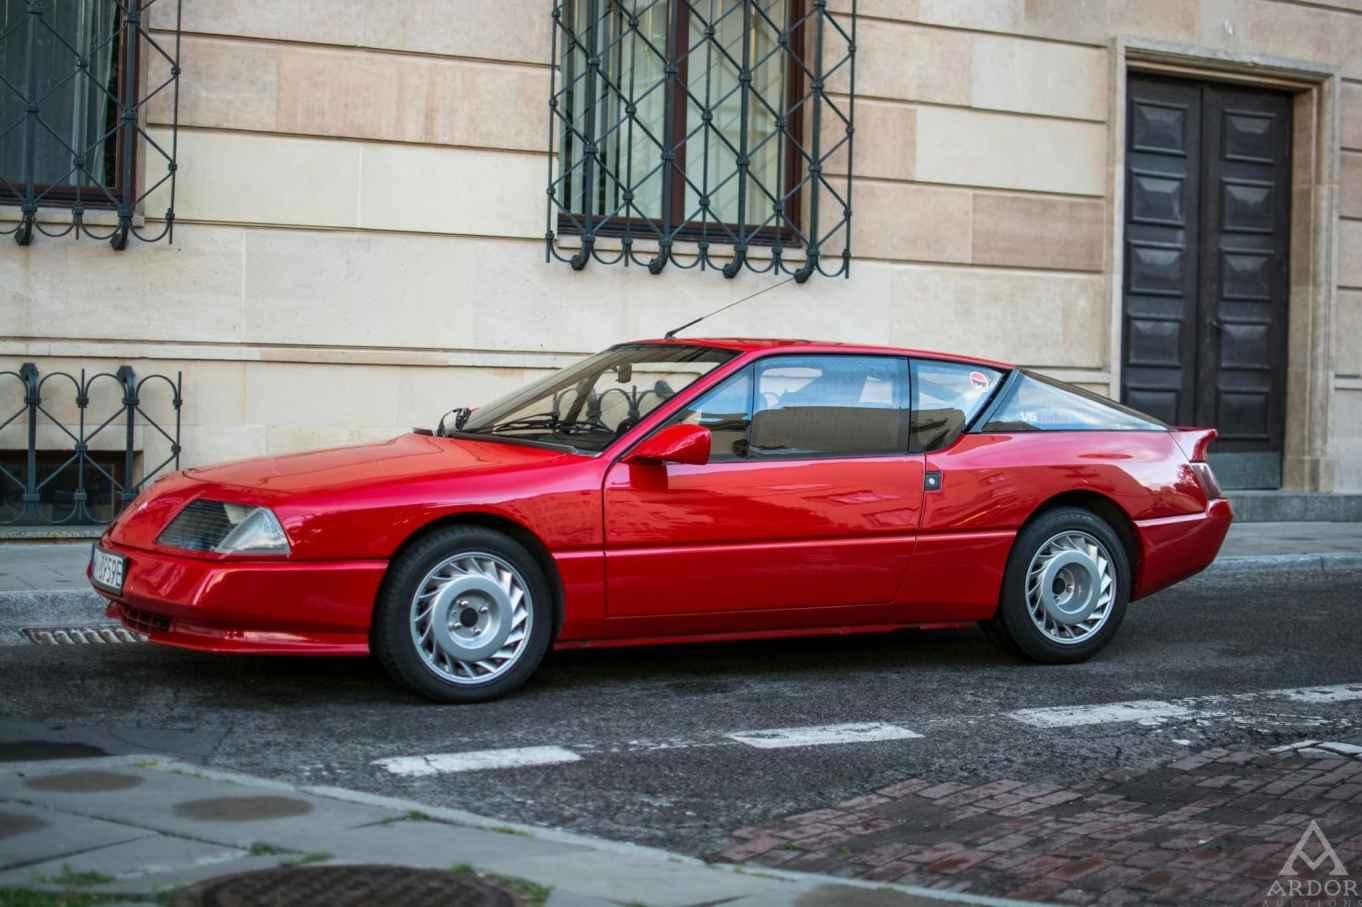 alpine-gta-v6-turbo-1987-auction-ardor-9